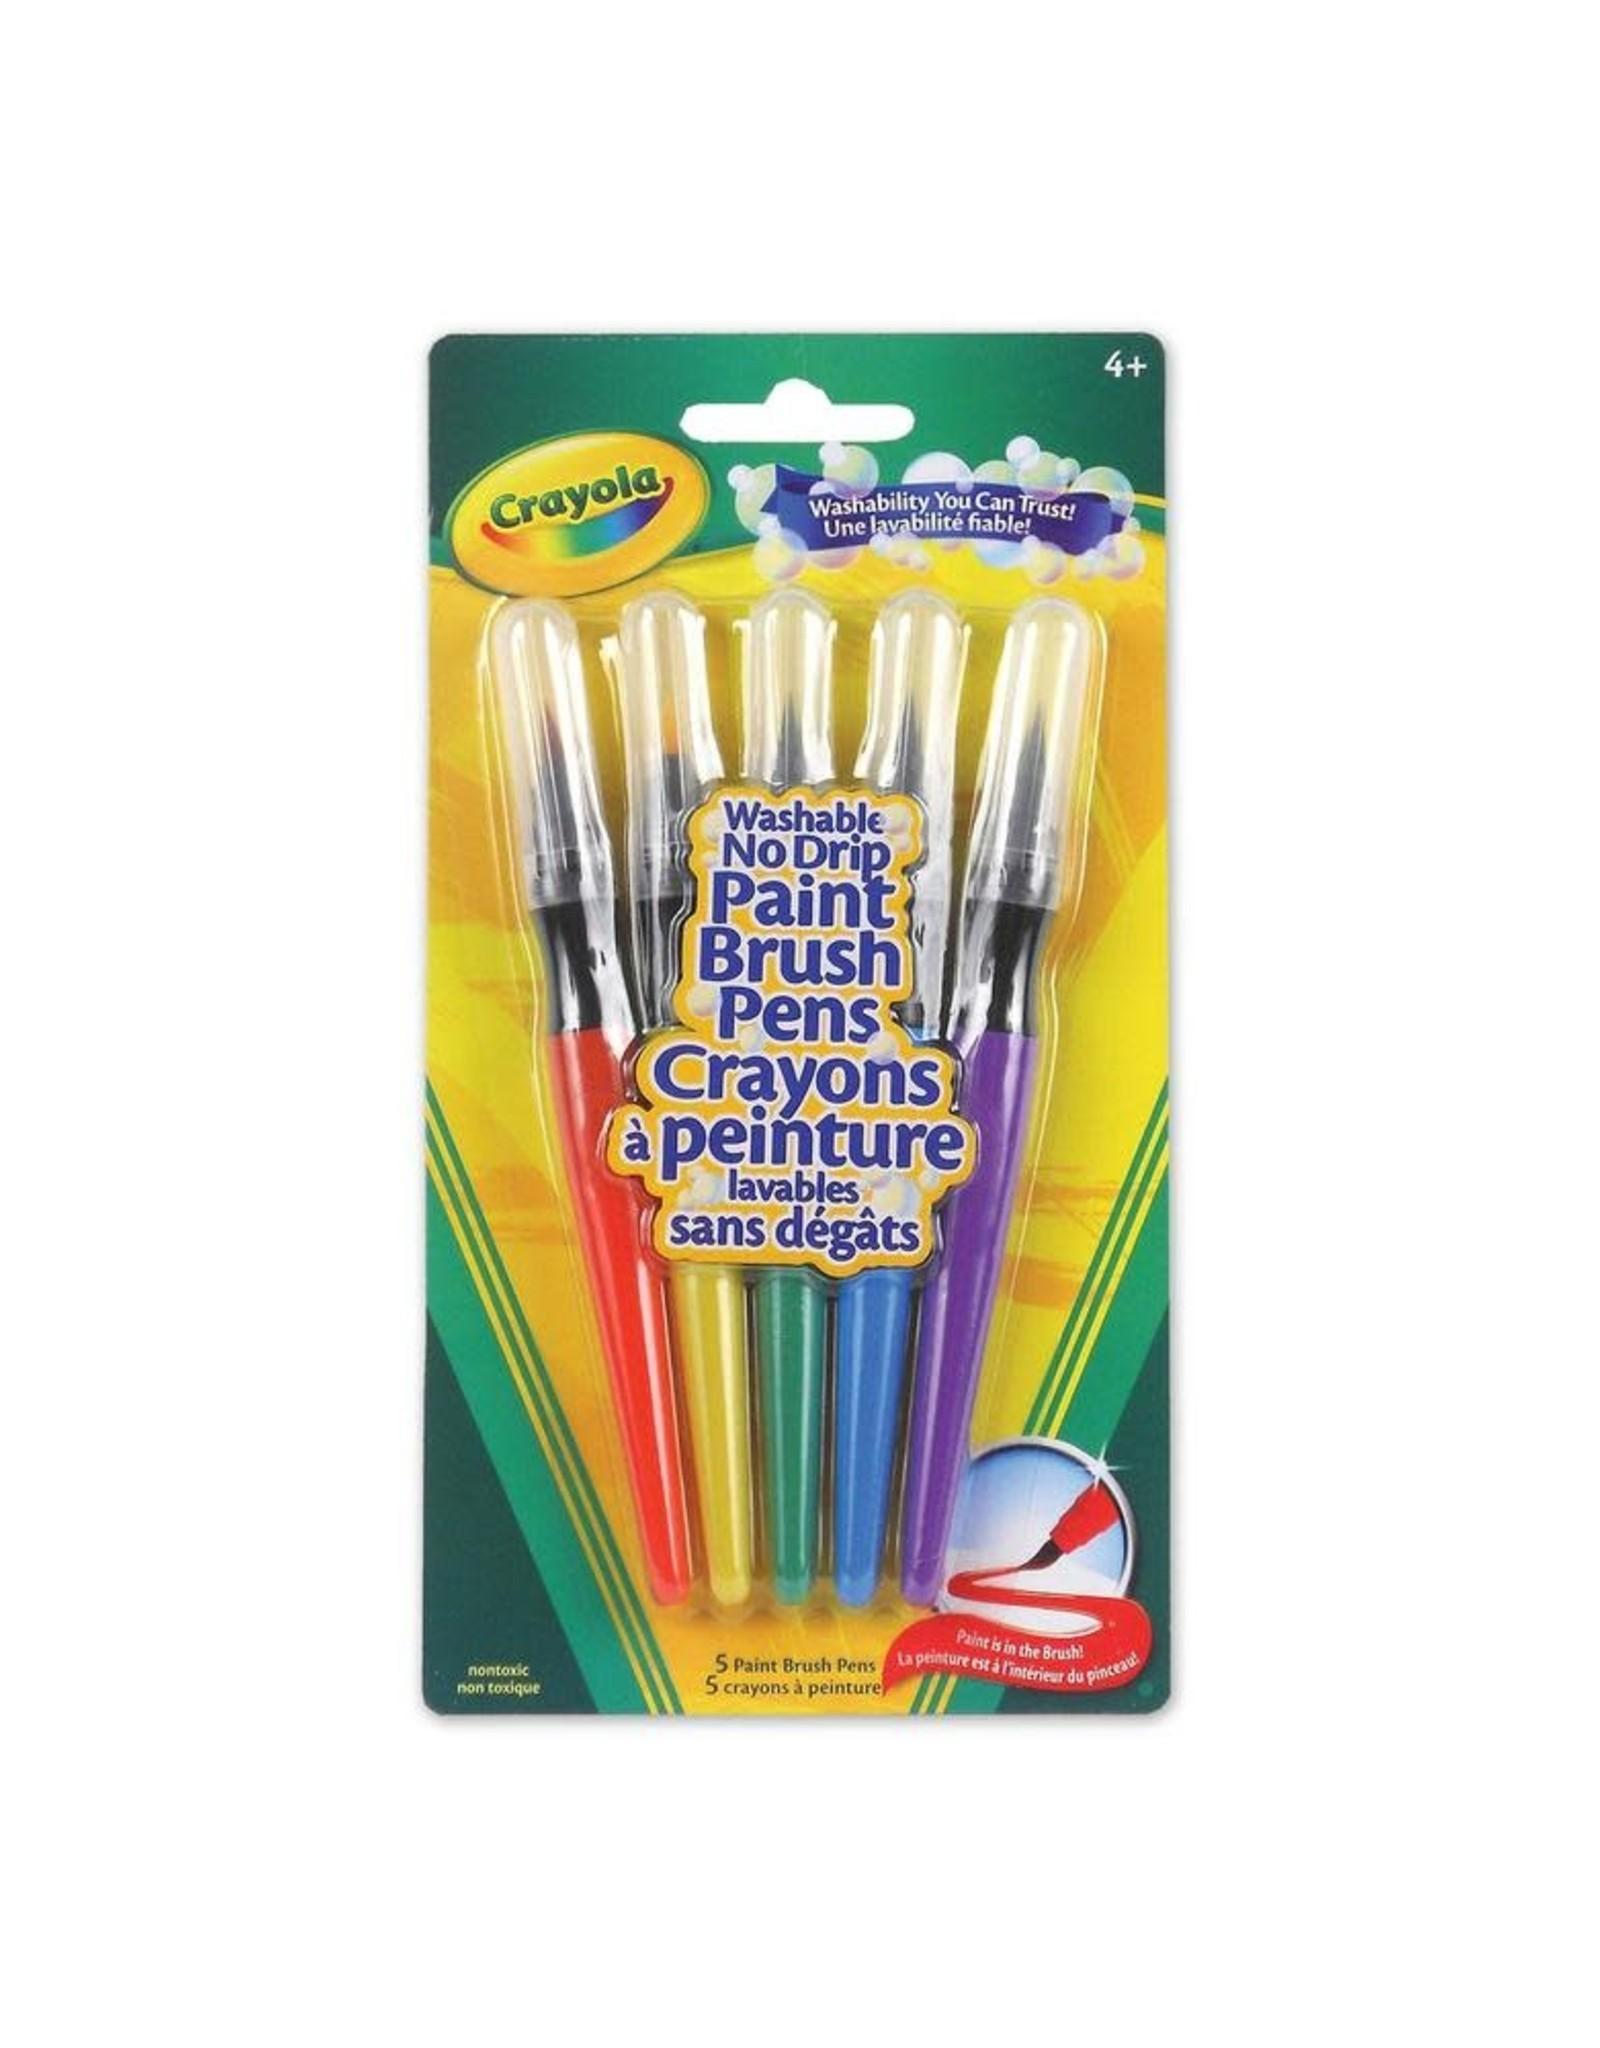 Crayola Paint Brush Pens, 5 ct